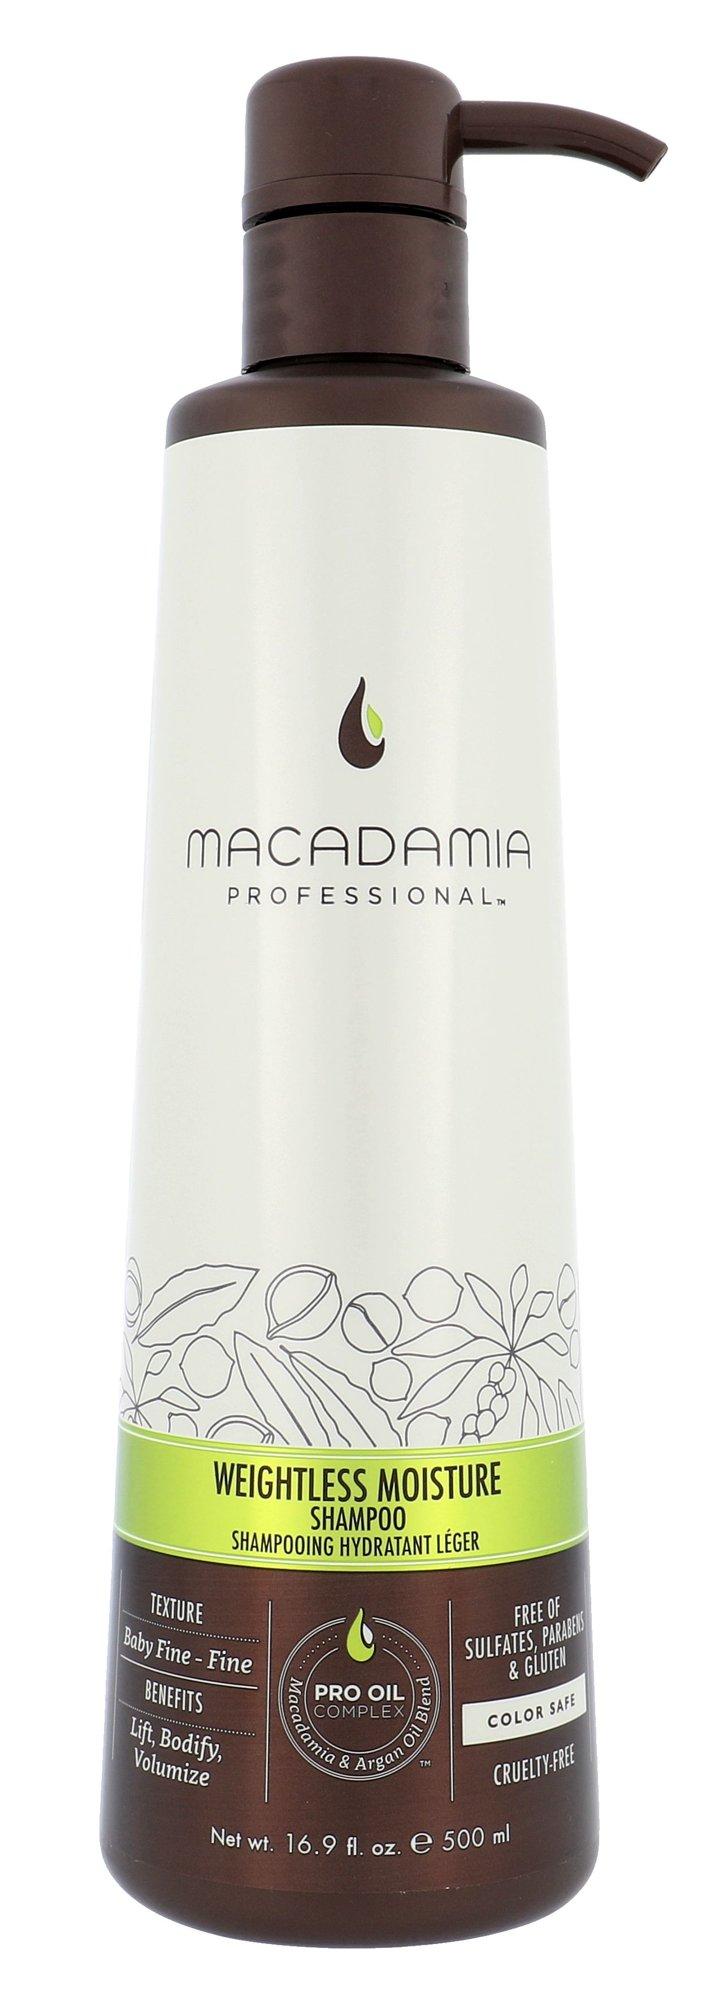 Macadamia Weightless Moisture Shampoo Cosmetic 500ml